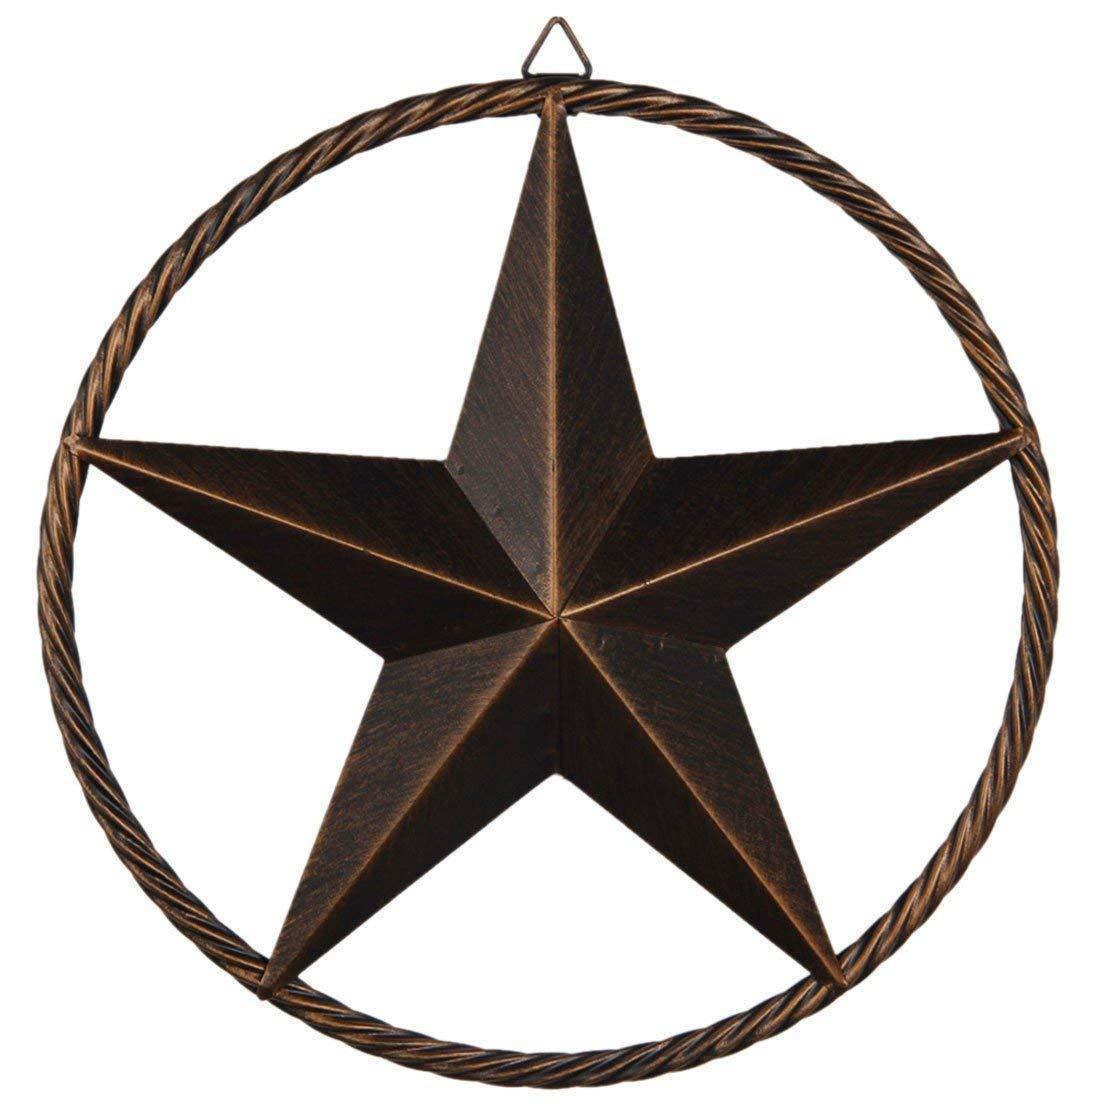 EBEI Texas Barn Star Circle Rustic Style Metal Decorative 12'' Vintage Metal Texas Lone Star Dark Brown Western Home Decor